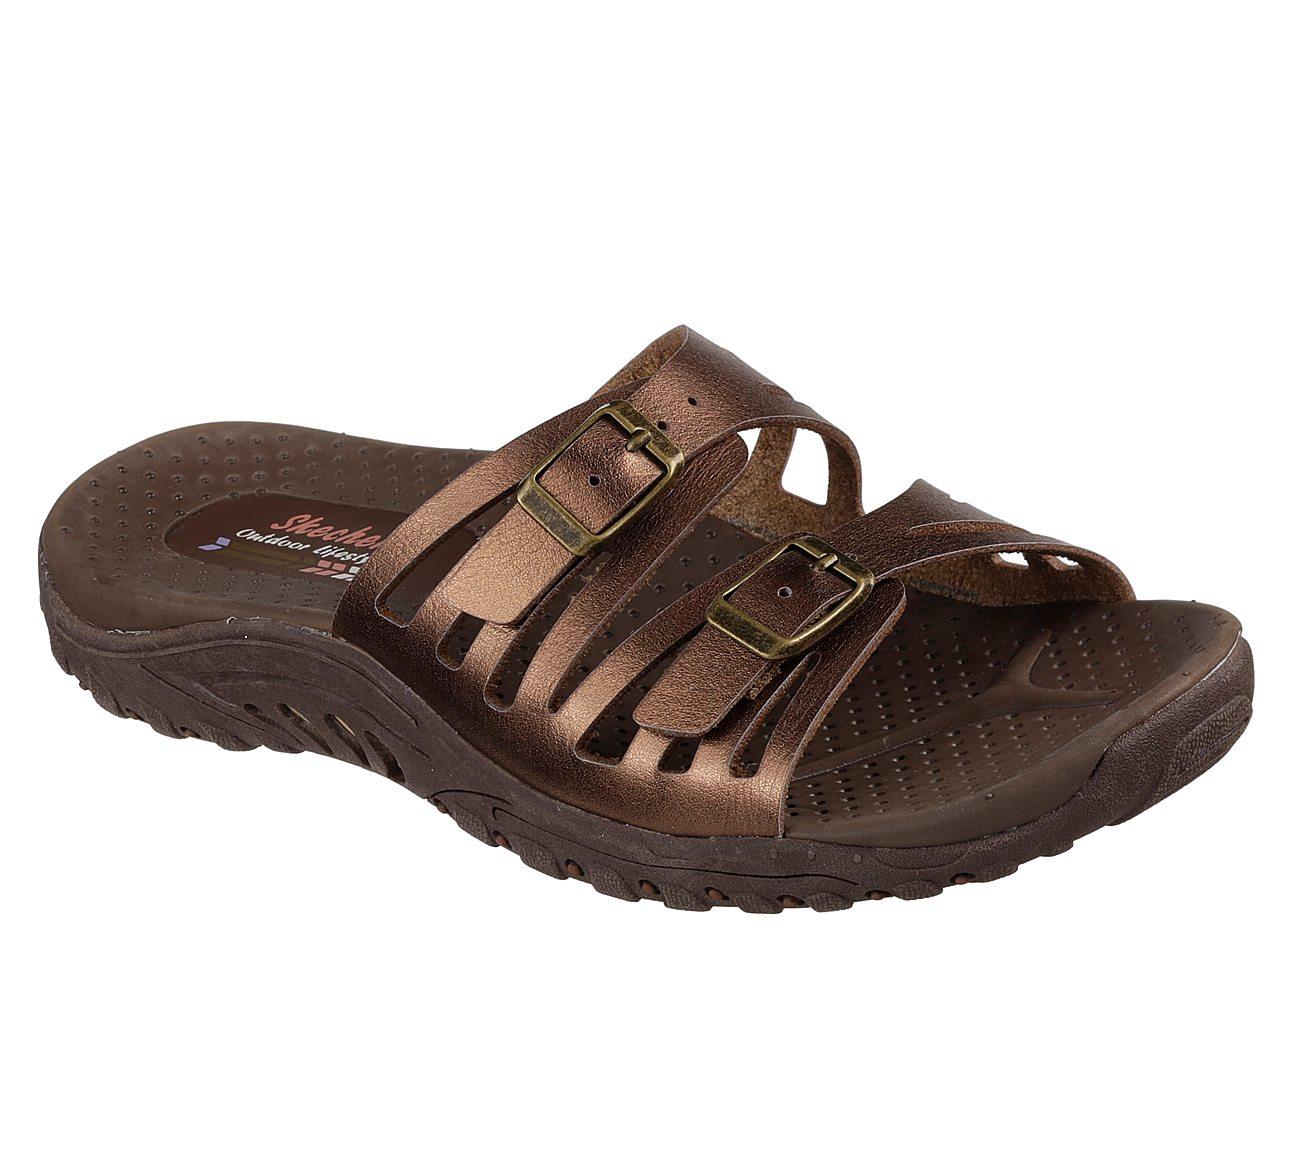 c4473a19bf8 Buy SKECHERS Reggae - Moon Rock Modern Comfort Shoes only  55.00